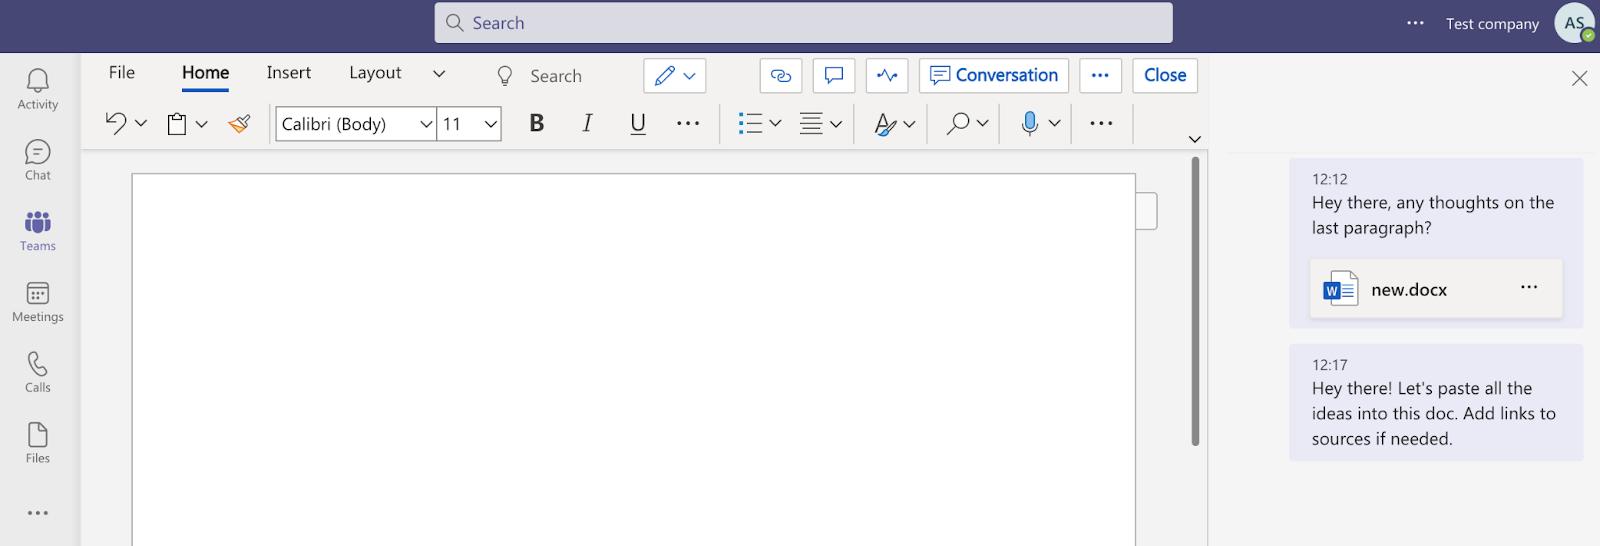 Editing a Word document on Microsoft Teams